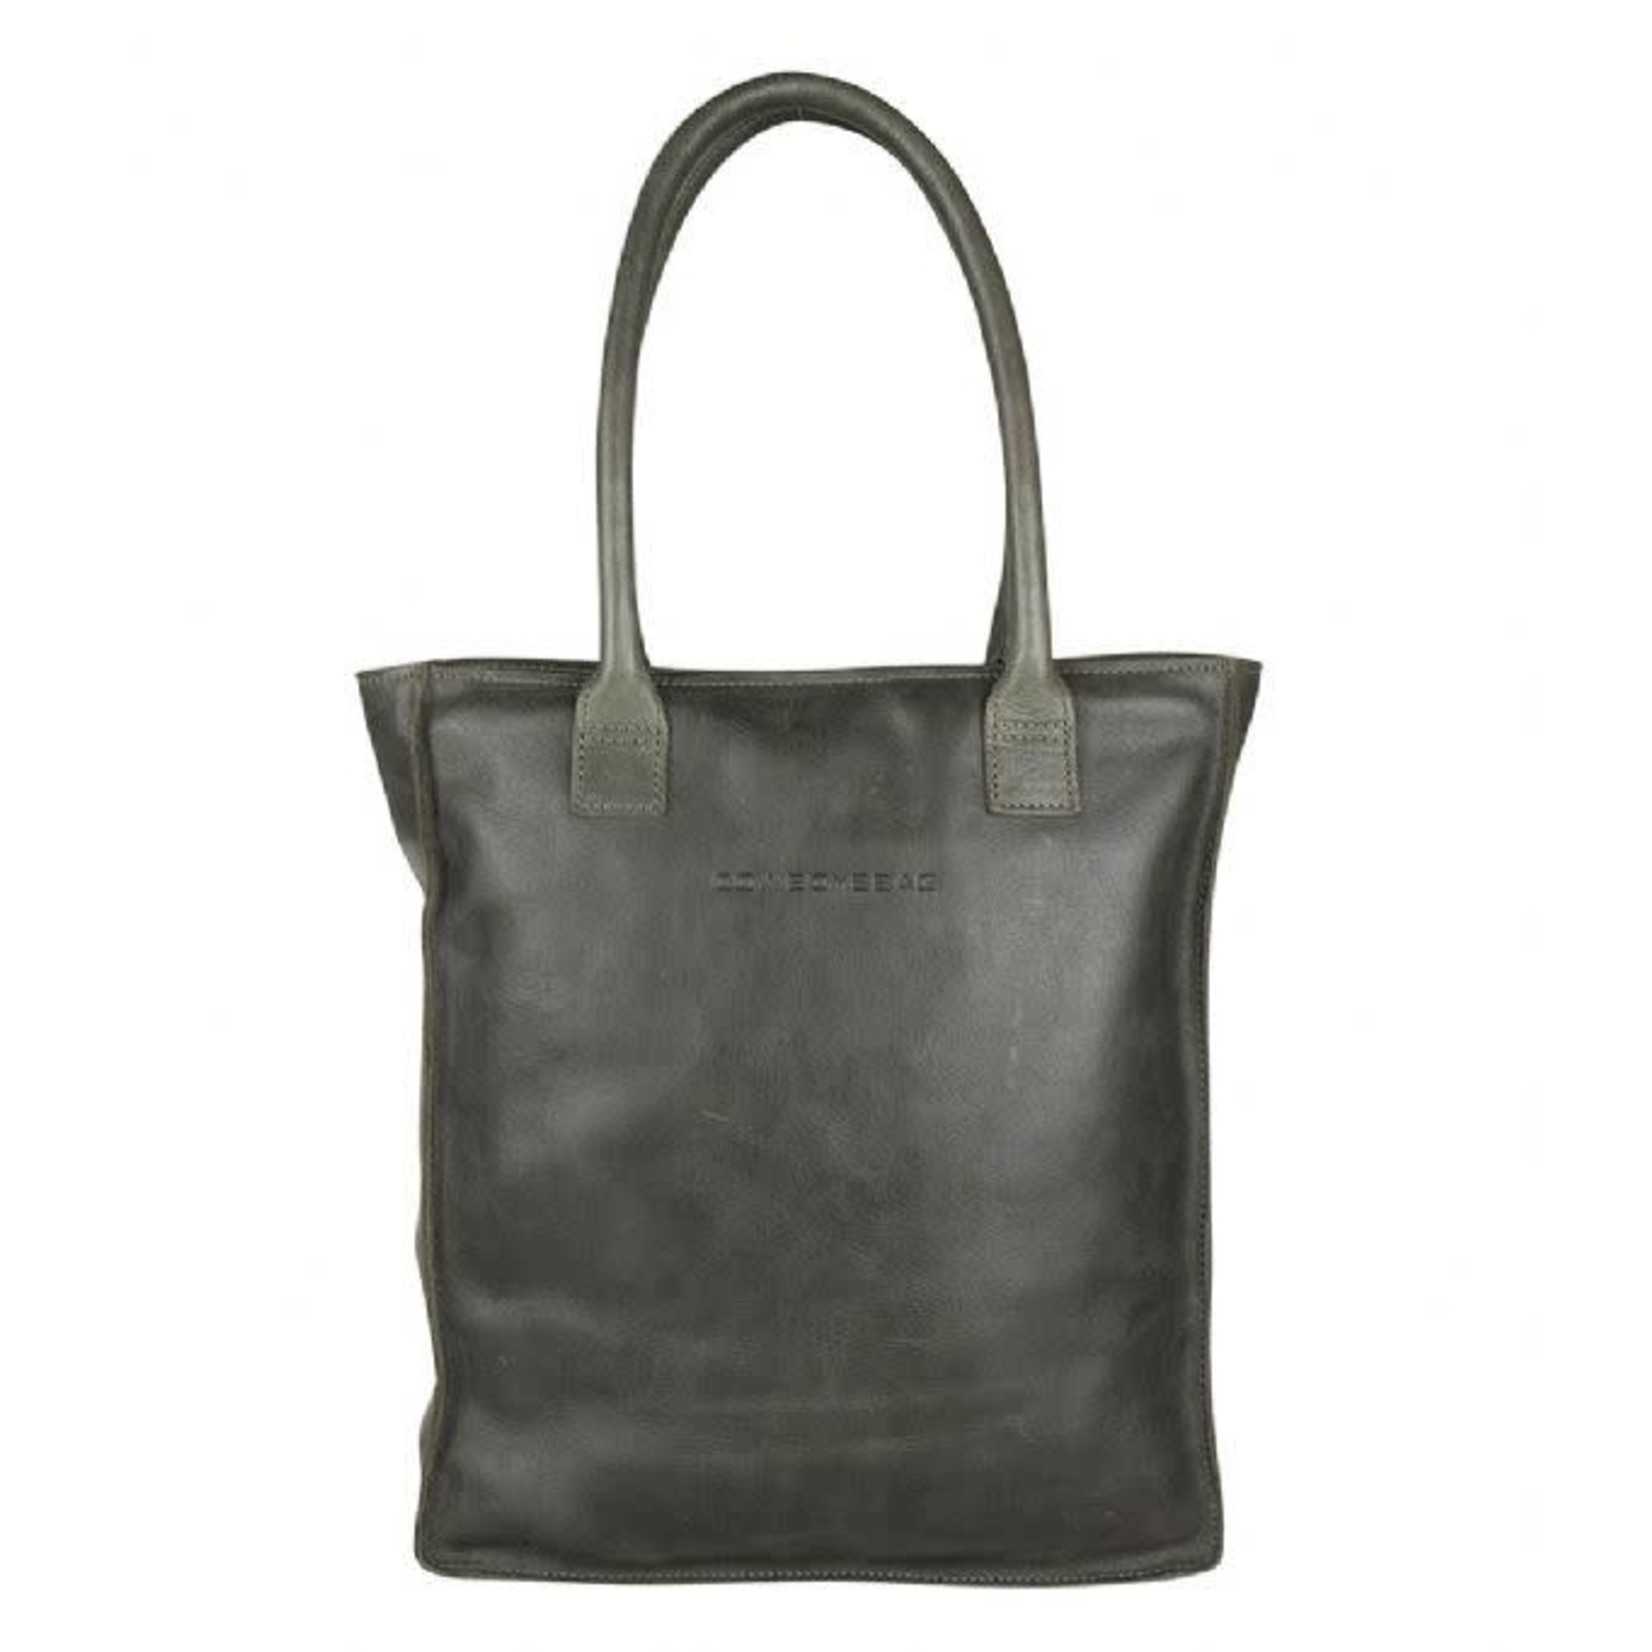 Cowboysbag Laptop Bag Woodridge Dark Green